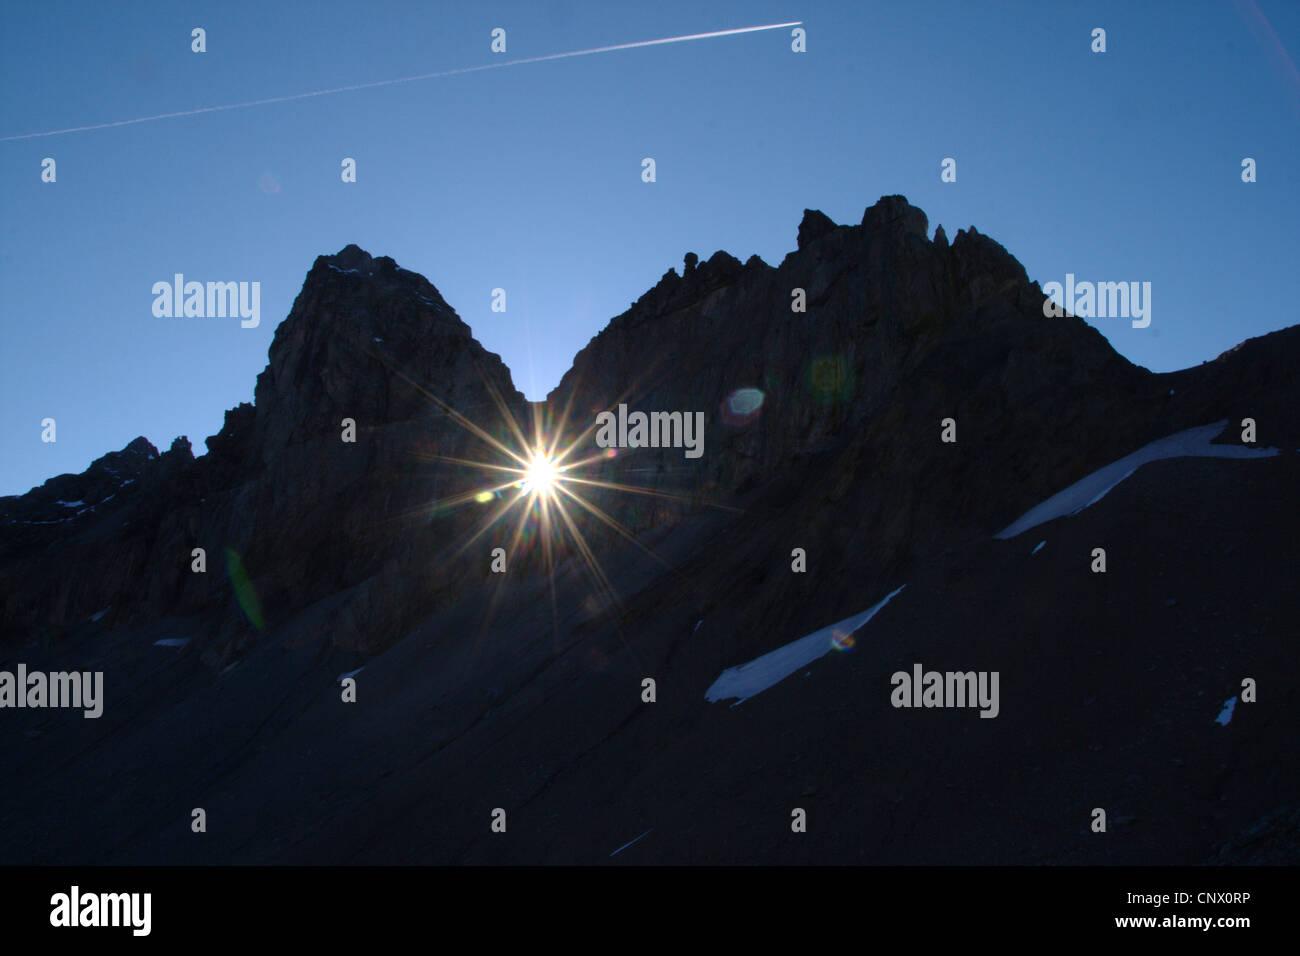 silhouette of Glarus thrust in the Tschingelhoerner with Martinsloch, Switzerland - Stock Image